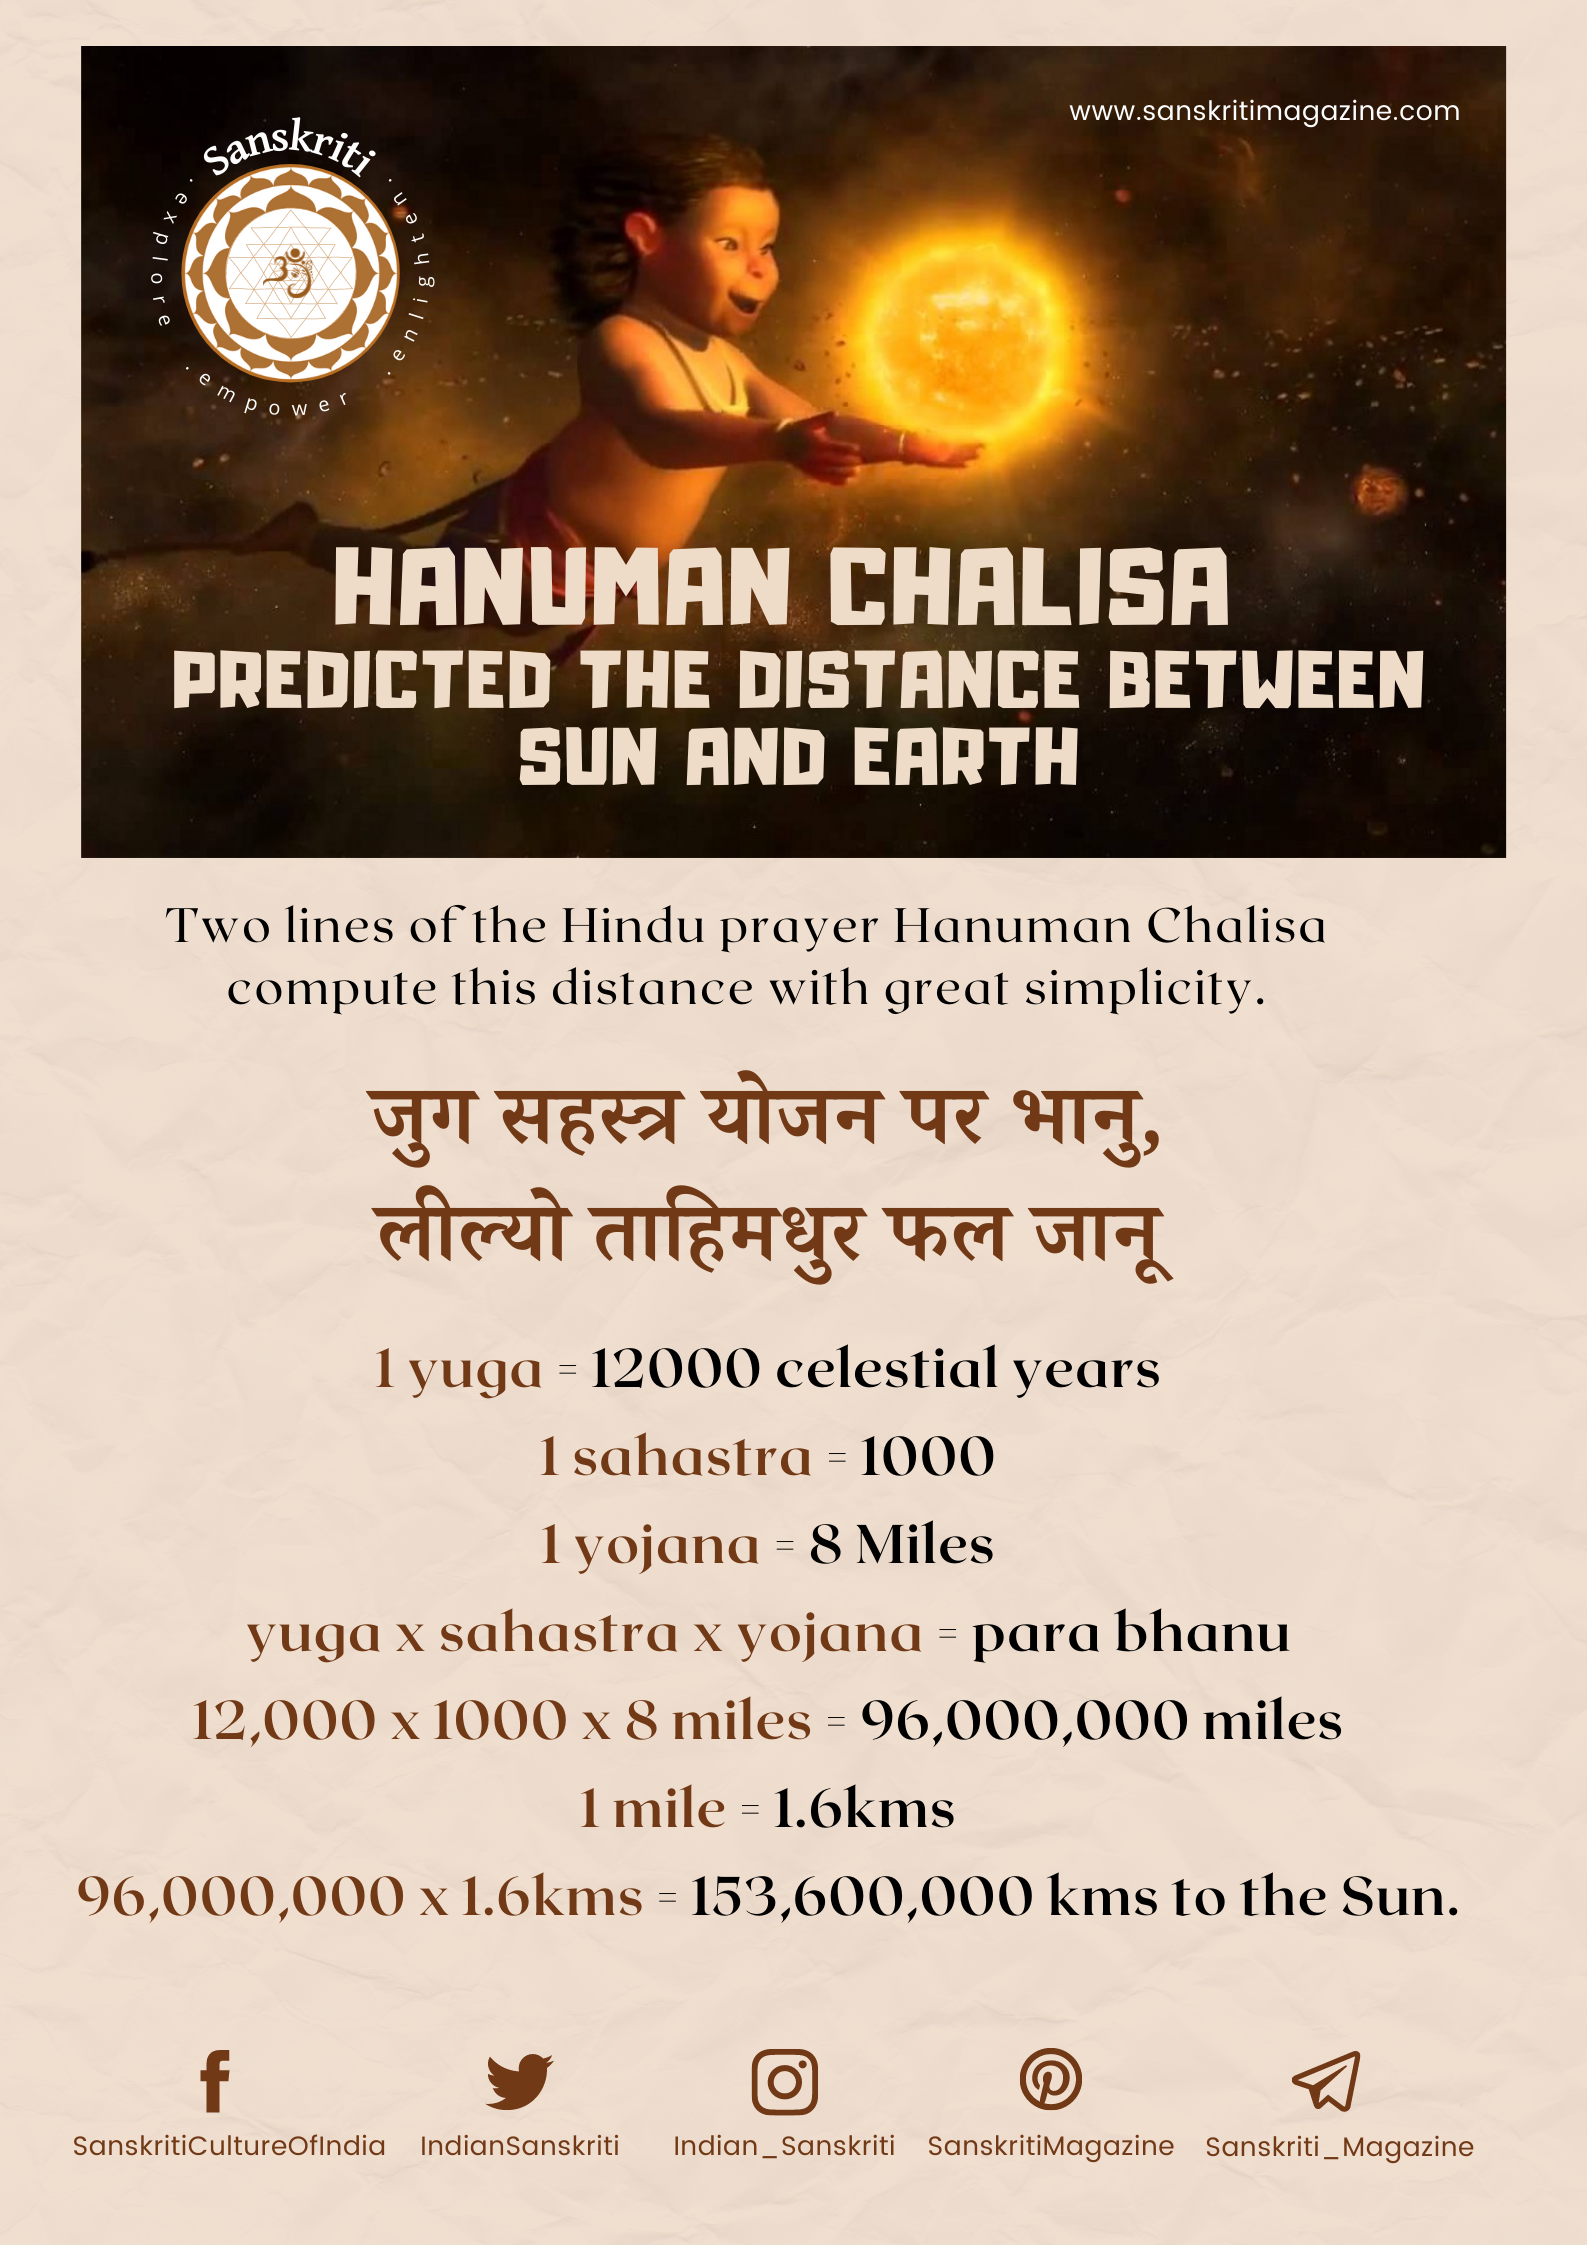 Hanuman Chalisa Predicted the Distance Between Sun and Earth